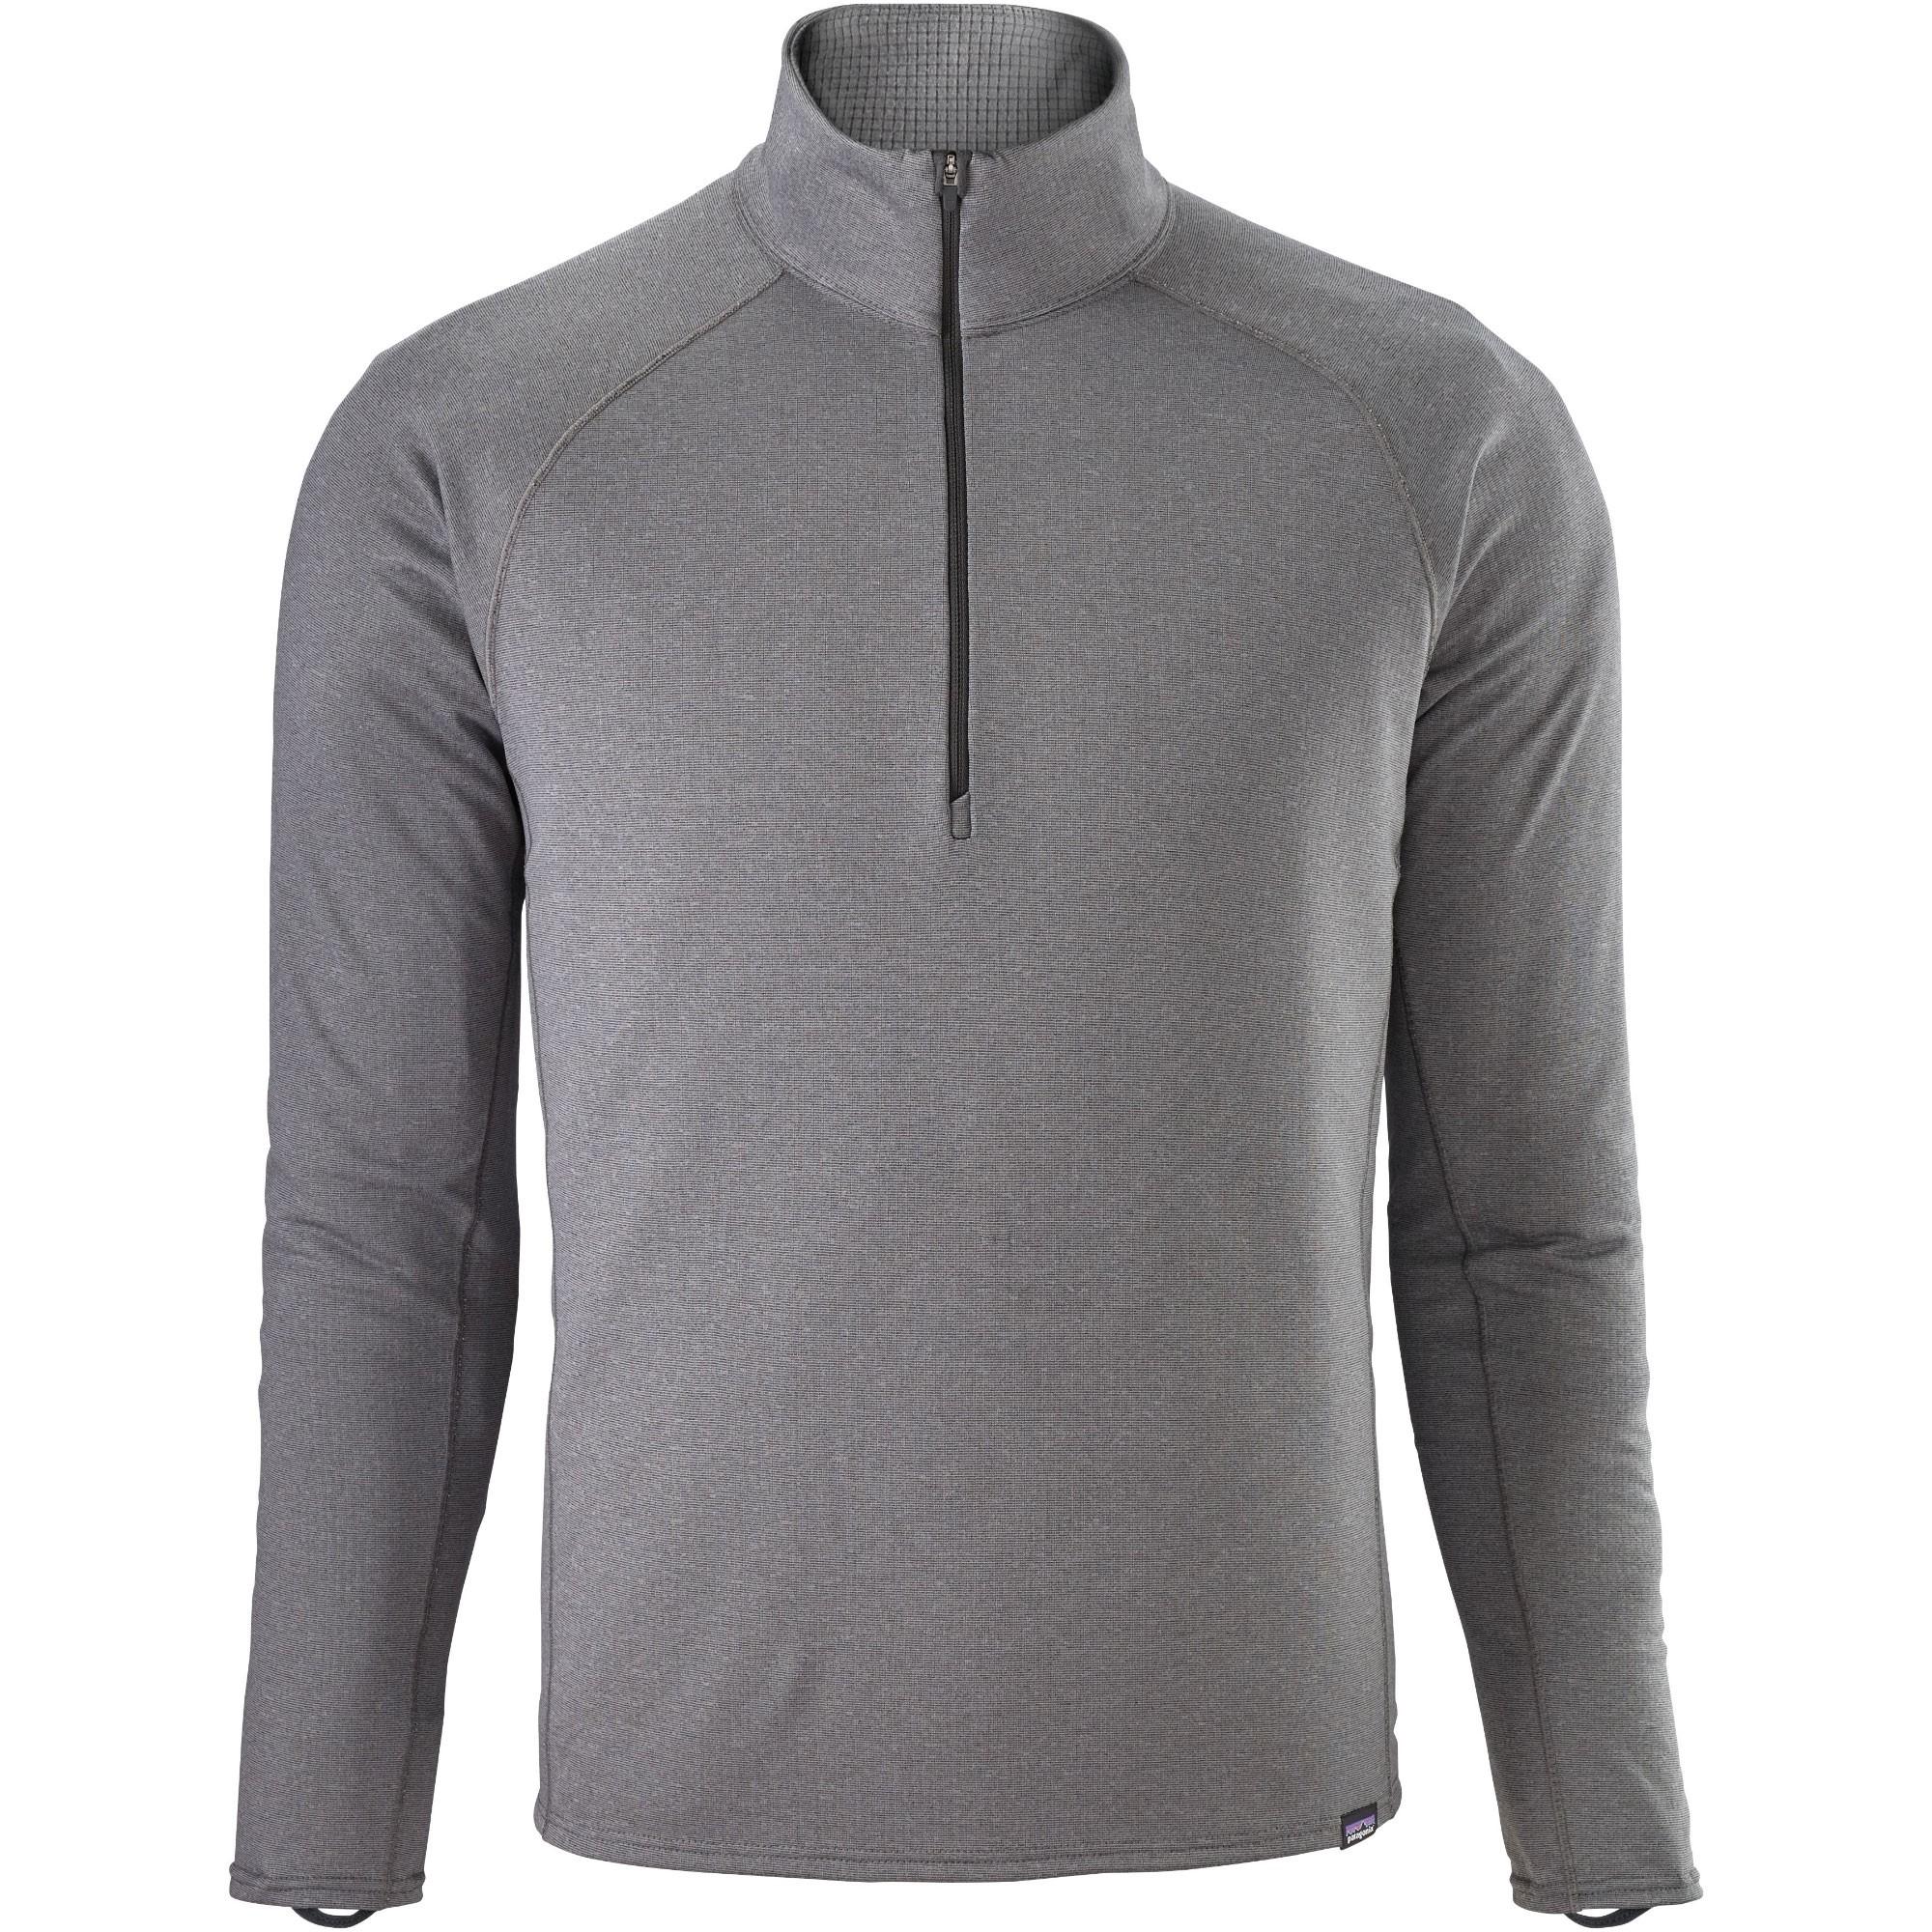 Patagonia Capilene Midweight Men's Zip-Neck - Forge Grey/Feather Grey X-Dye